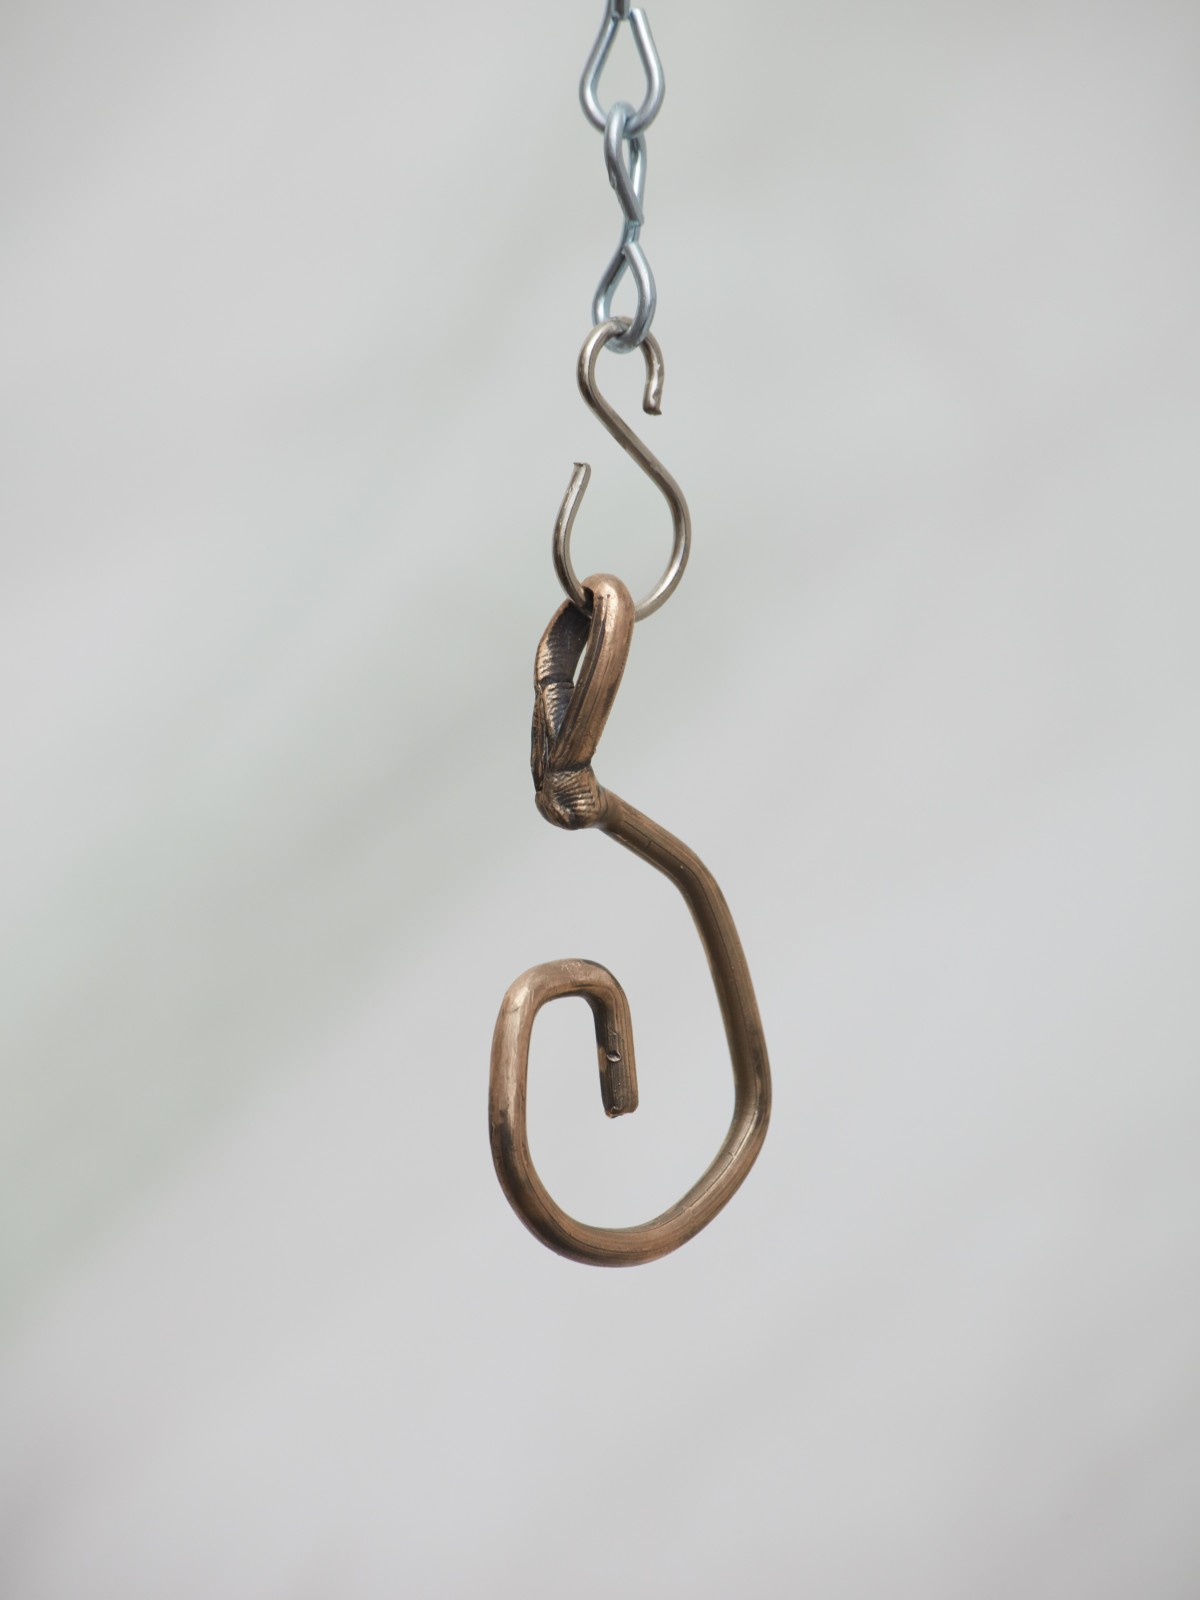 Jaakko Pallasvuo, Pendant I, 2016, Bronze, 2 x 1 x .5 in, 6 x 3 x 1 cm